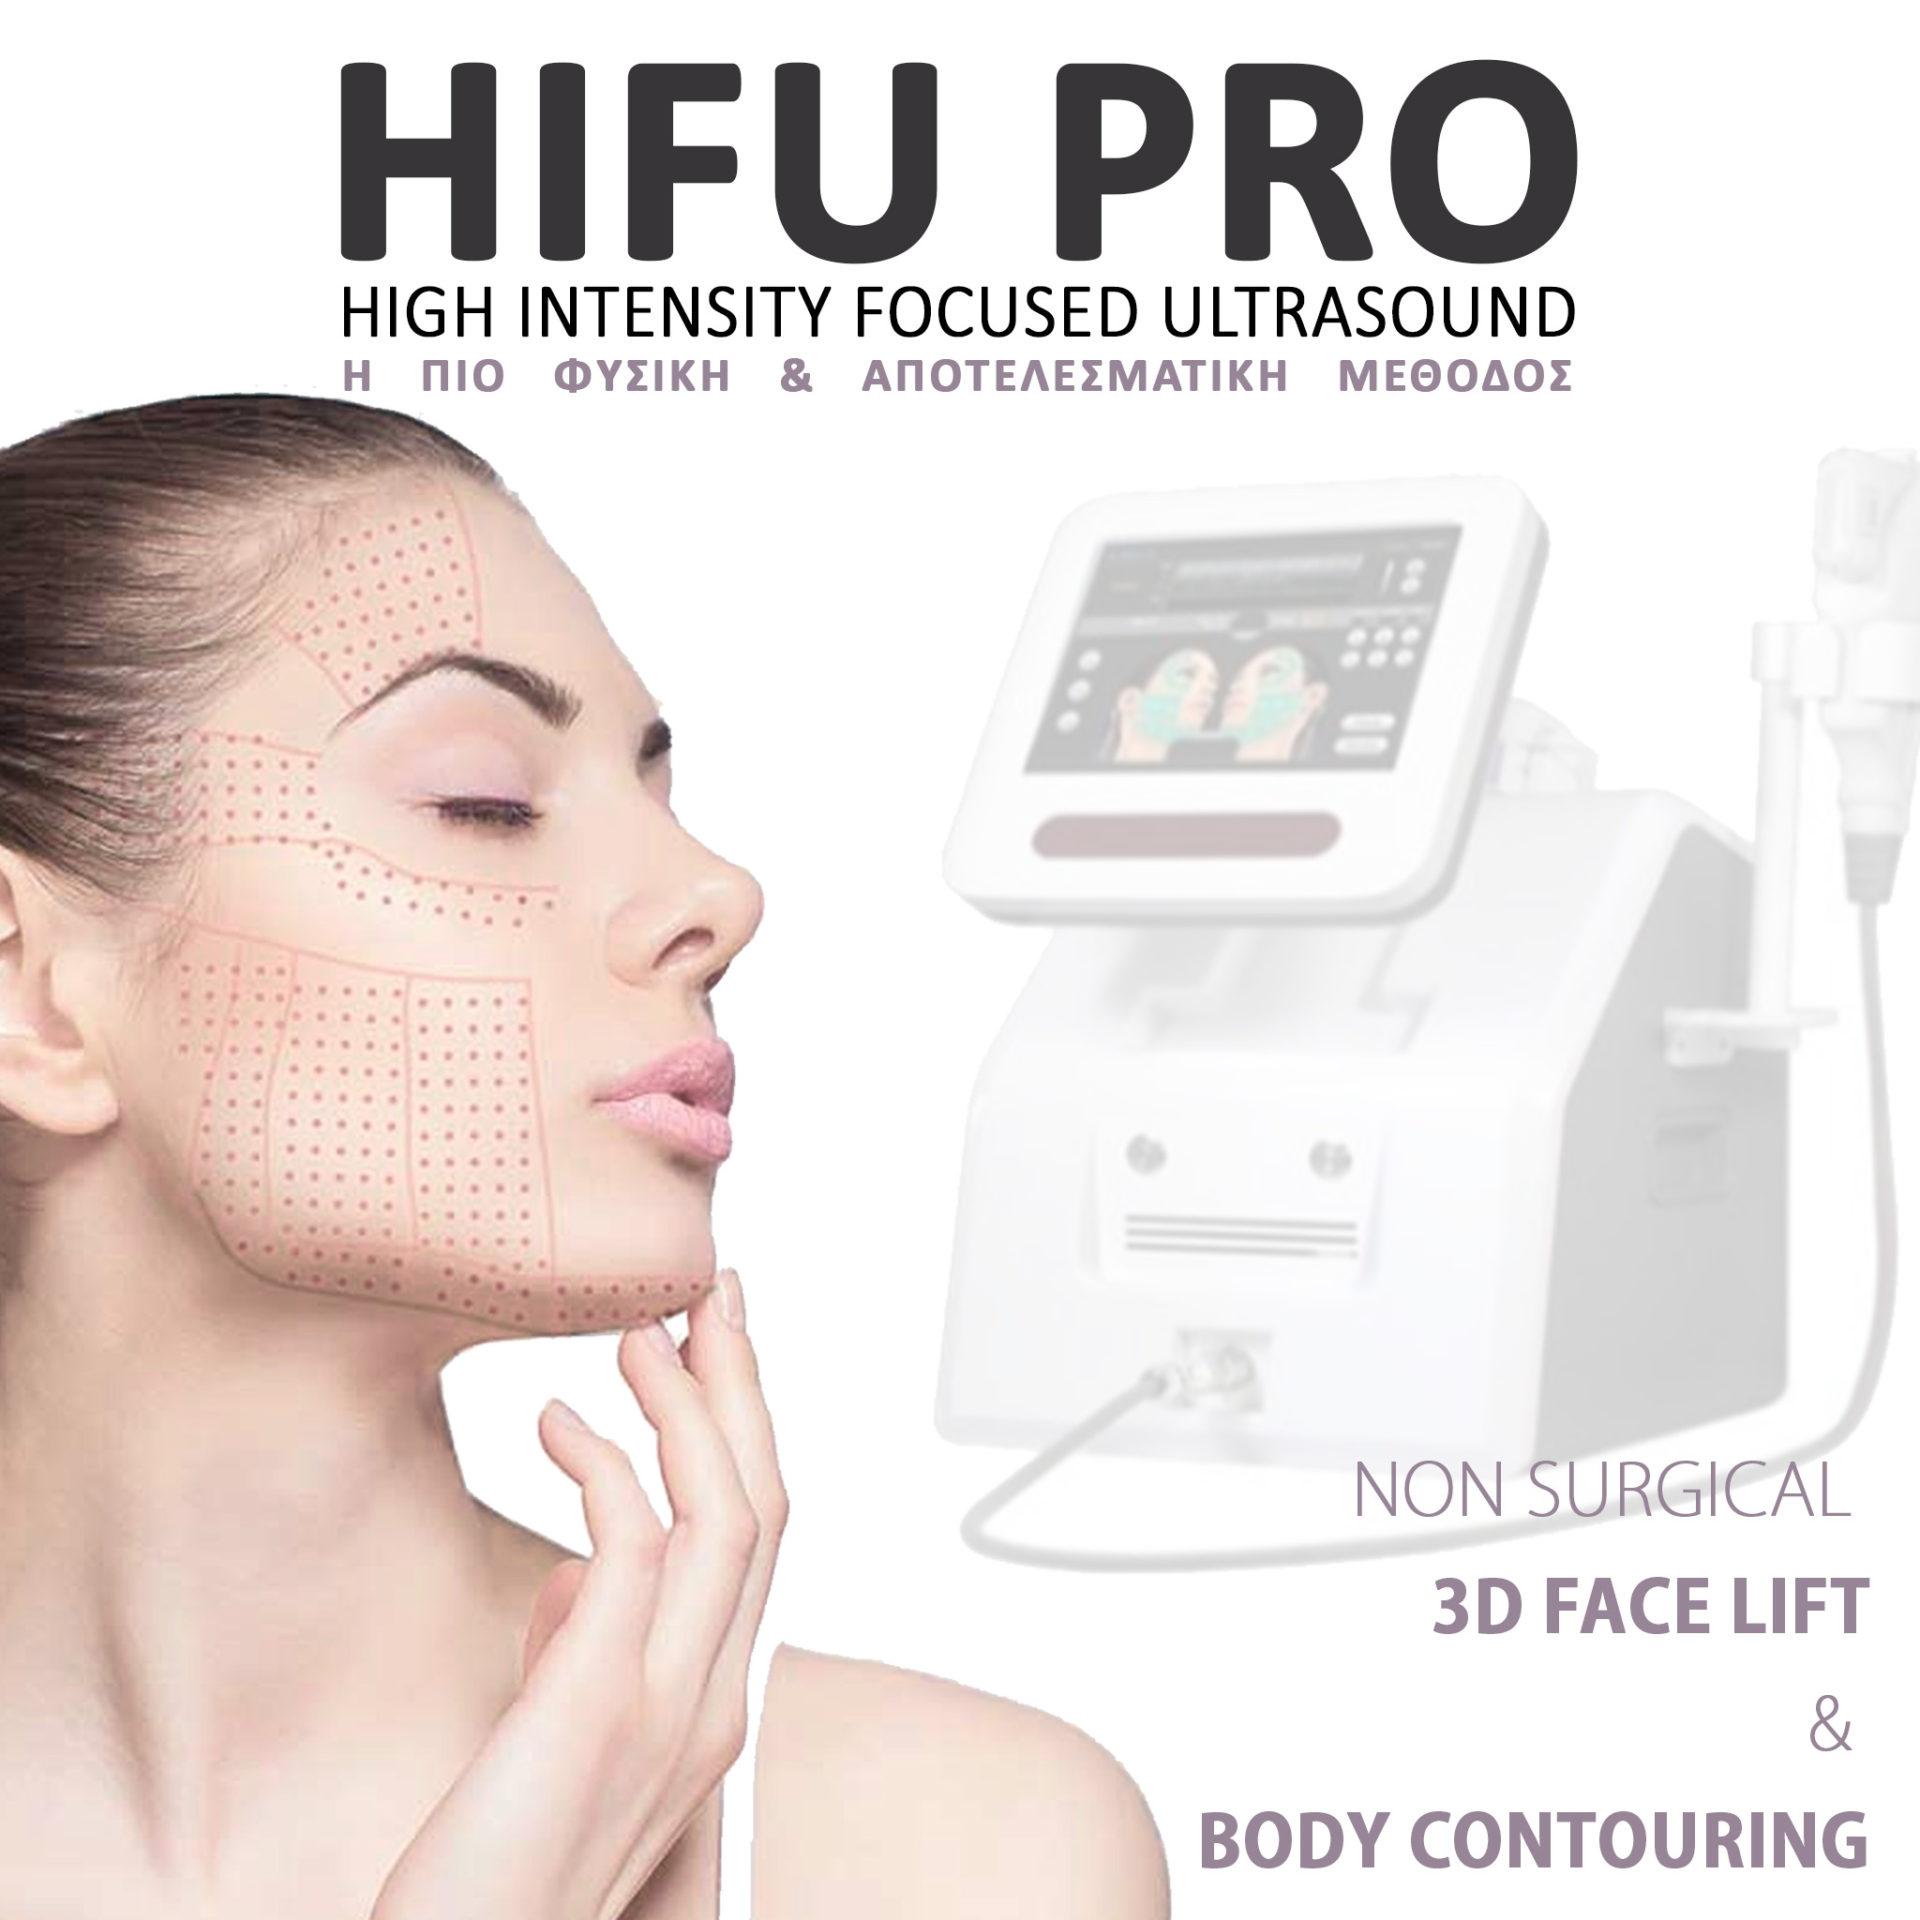 hifu-pro-3d-lift